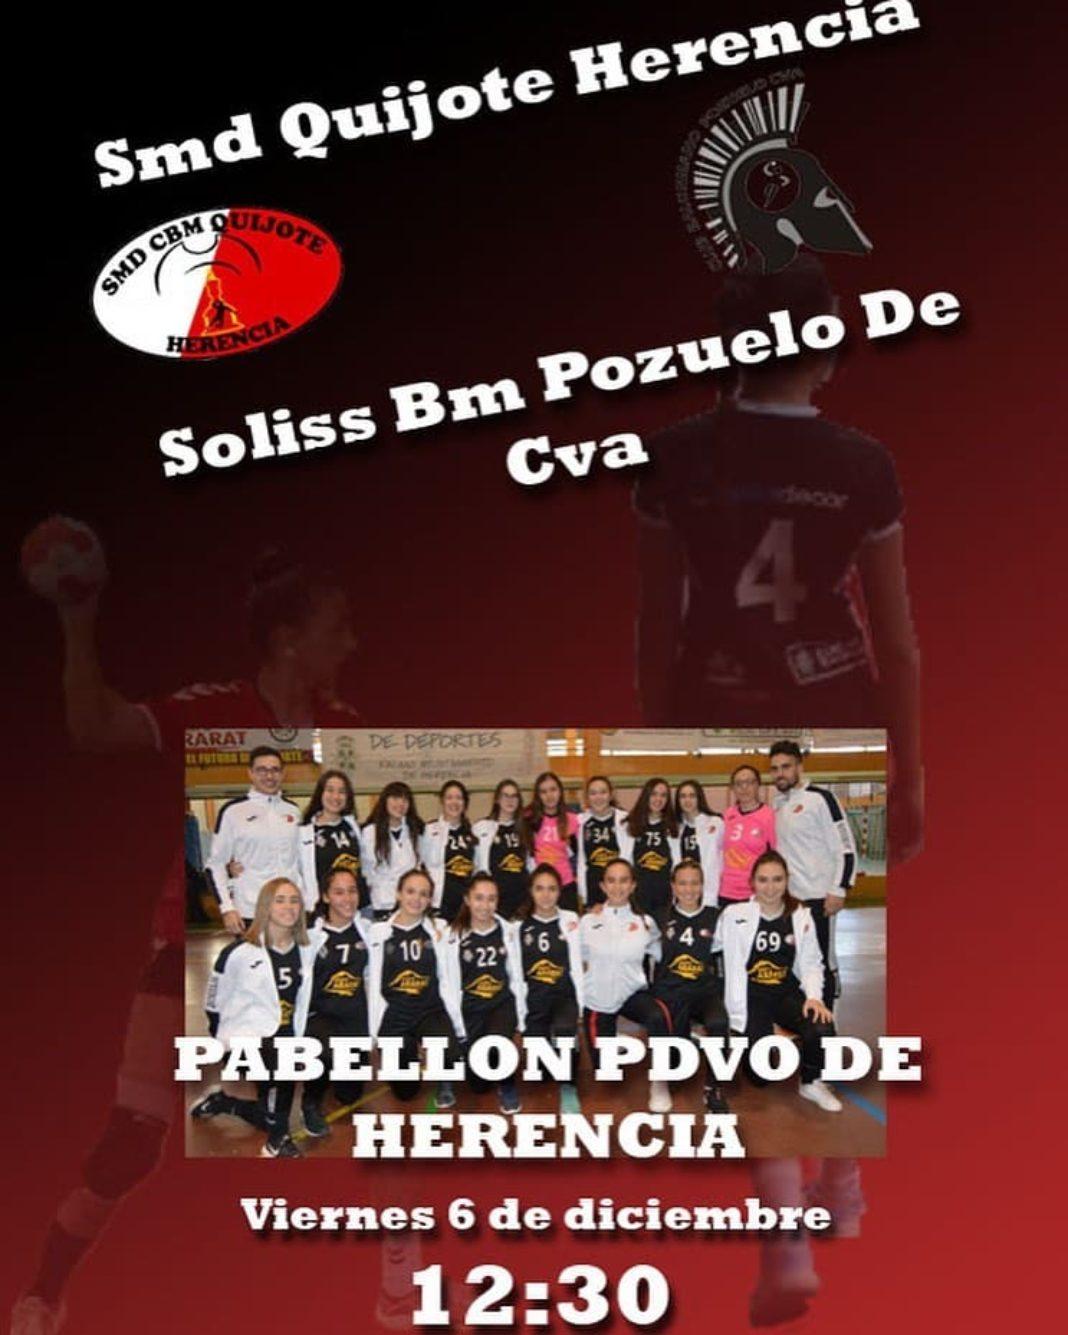 SMD Quijote Herencia frente al Soliss Bm Pozuelo de Cva este 6 de diciembre 4